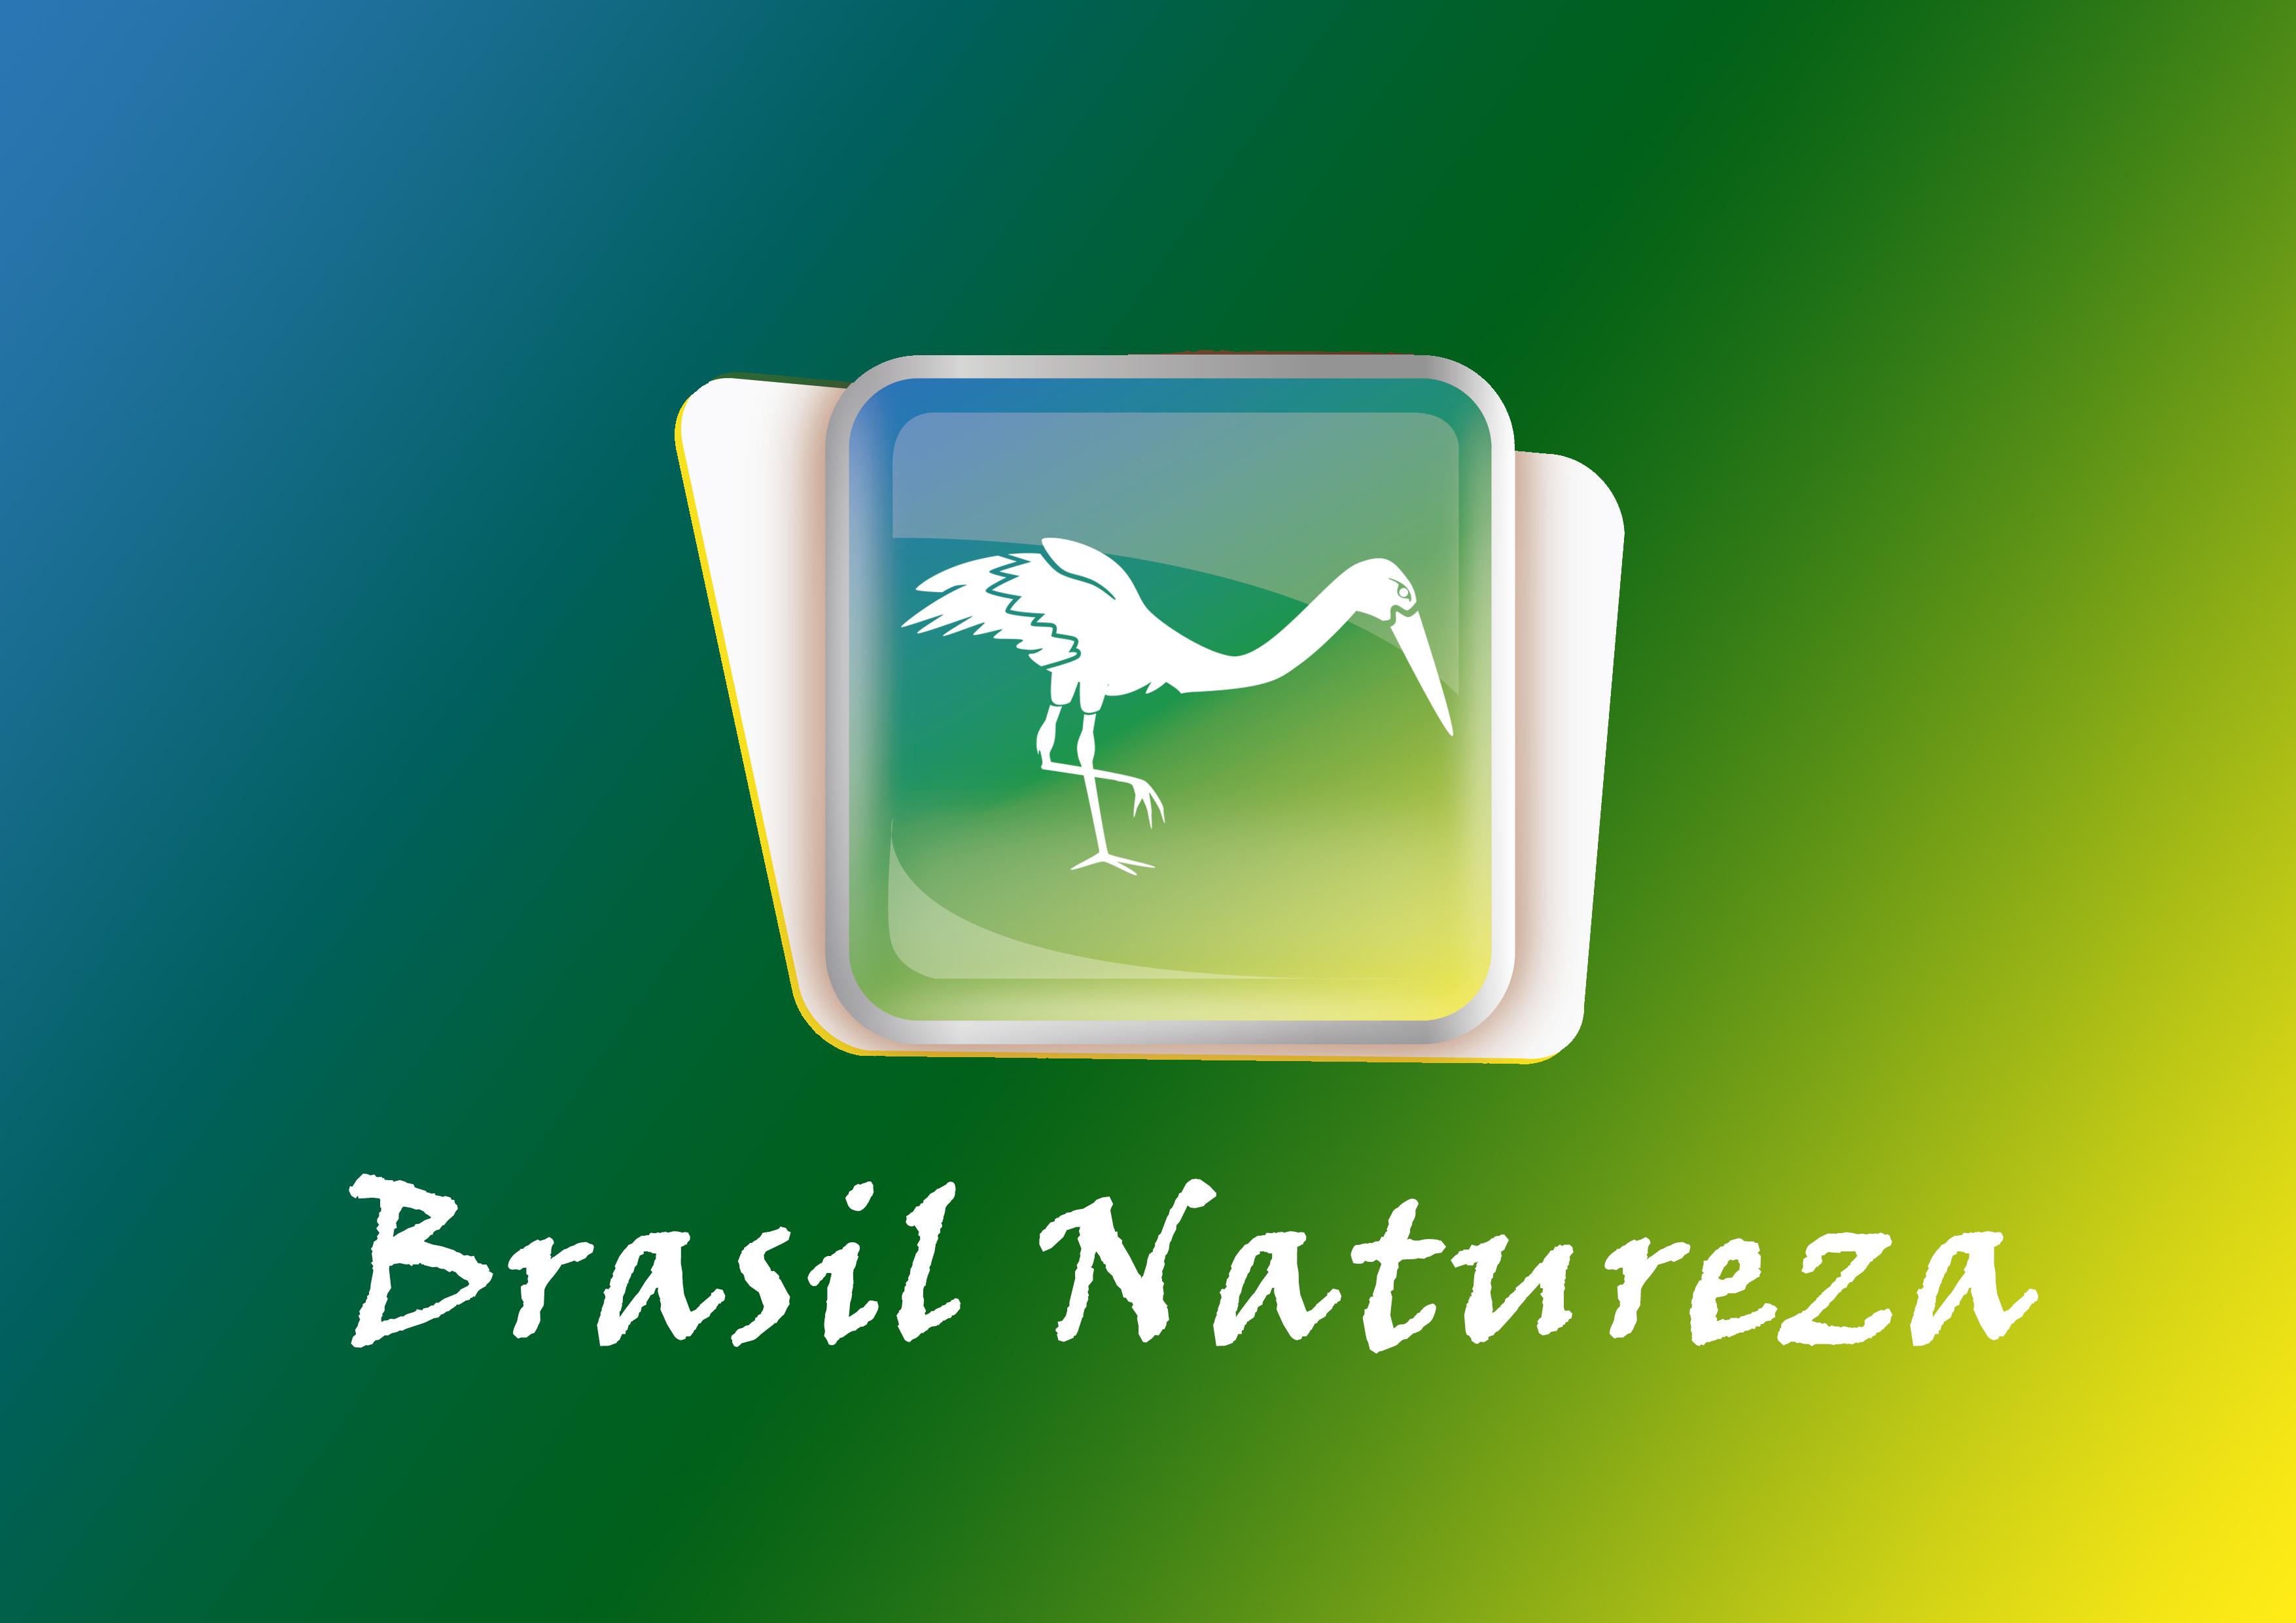 Brasil natureza inverso